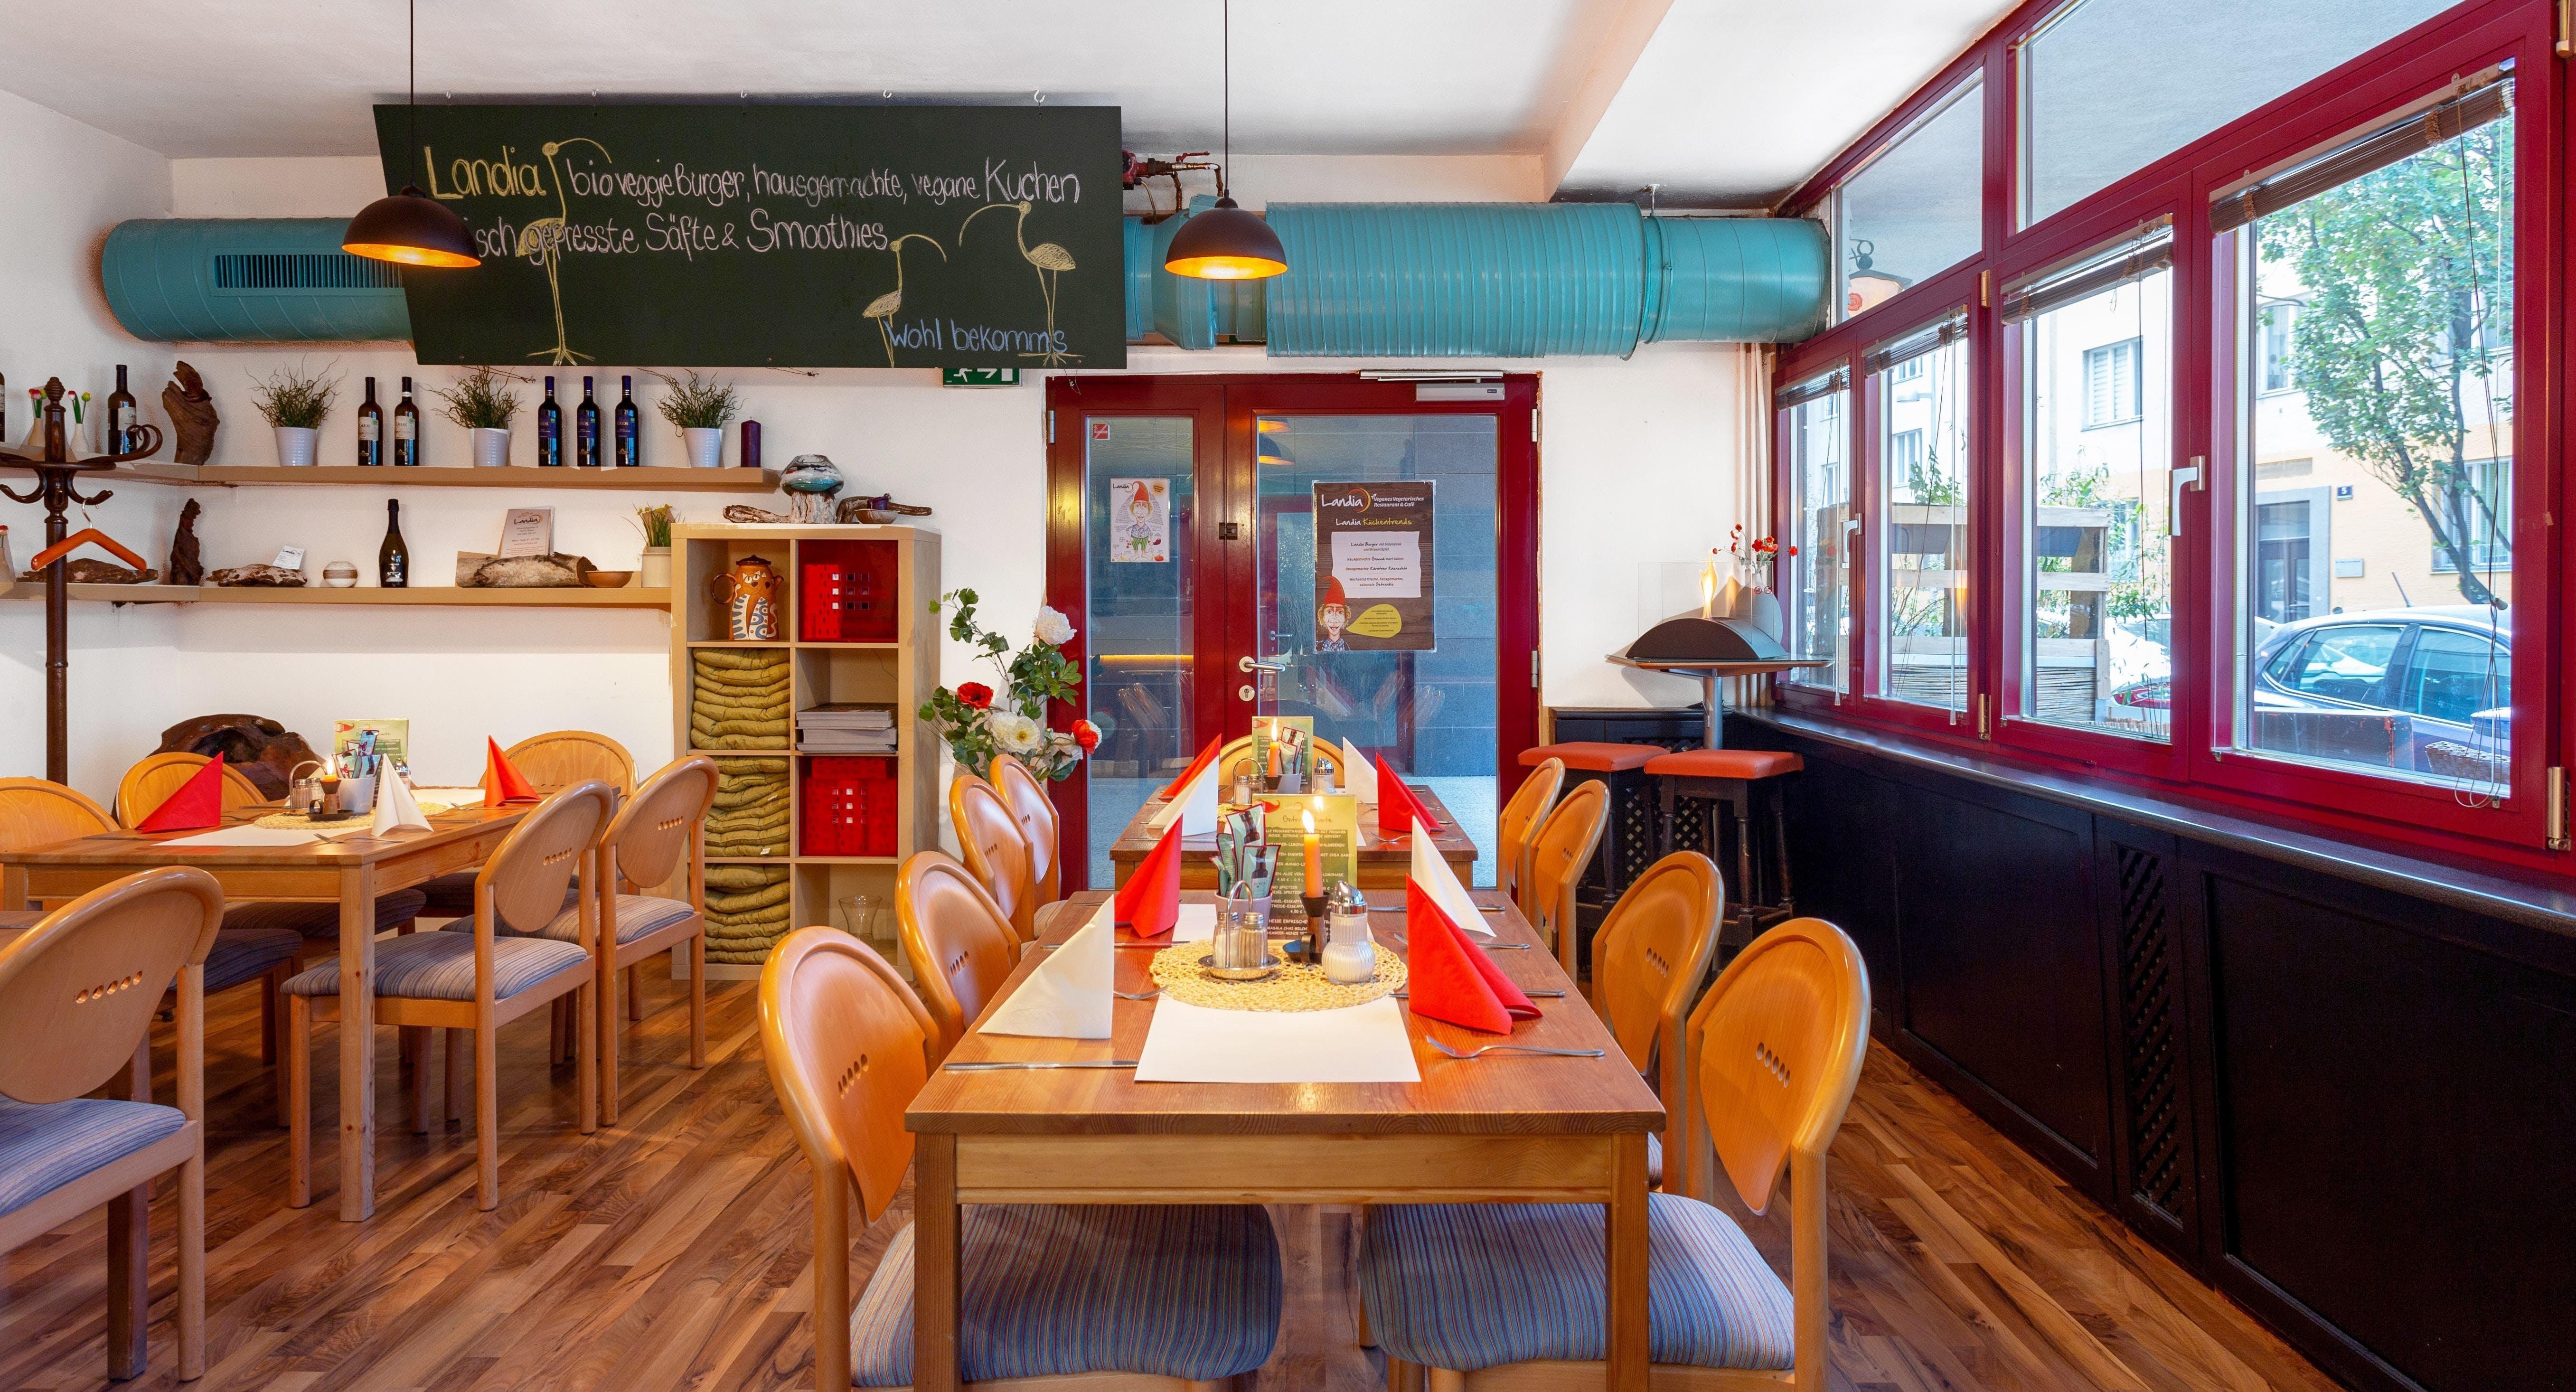 Restaurant Landia Wien image 2